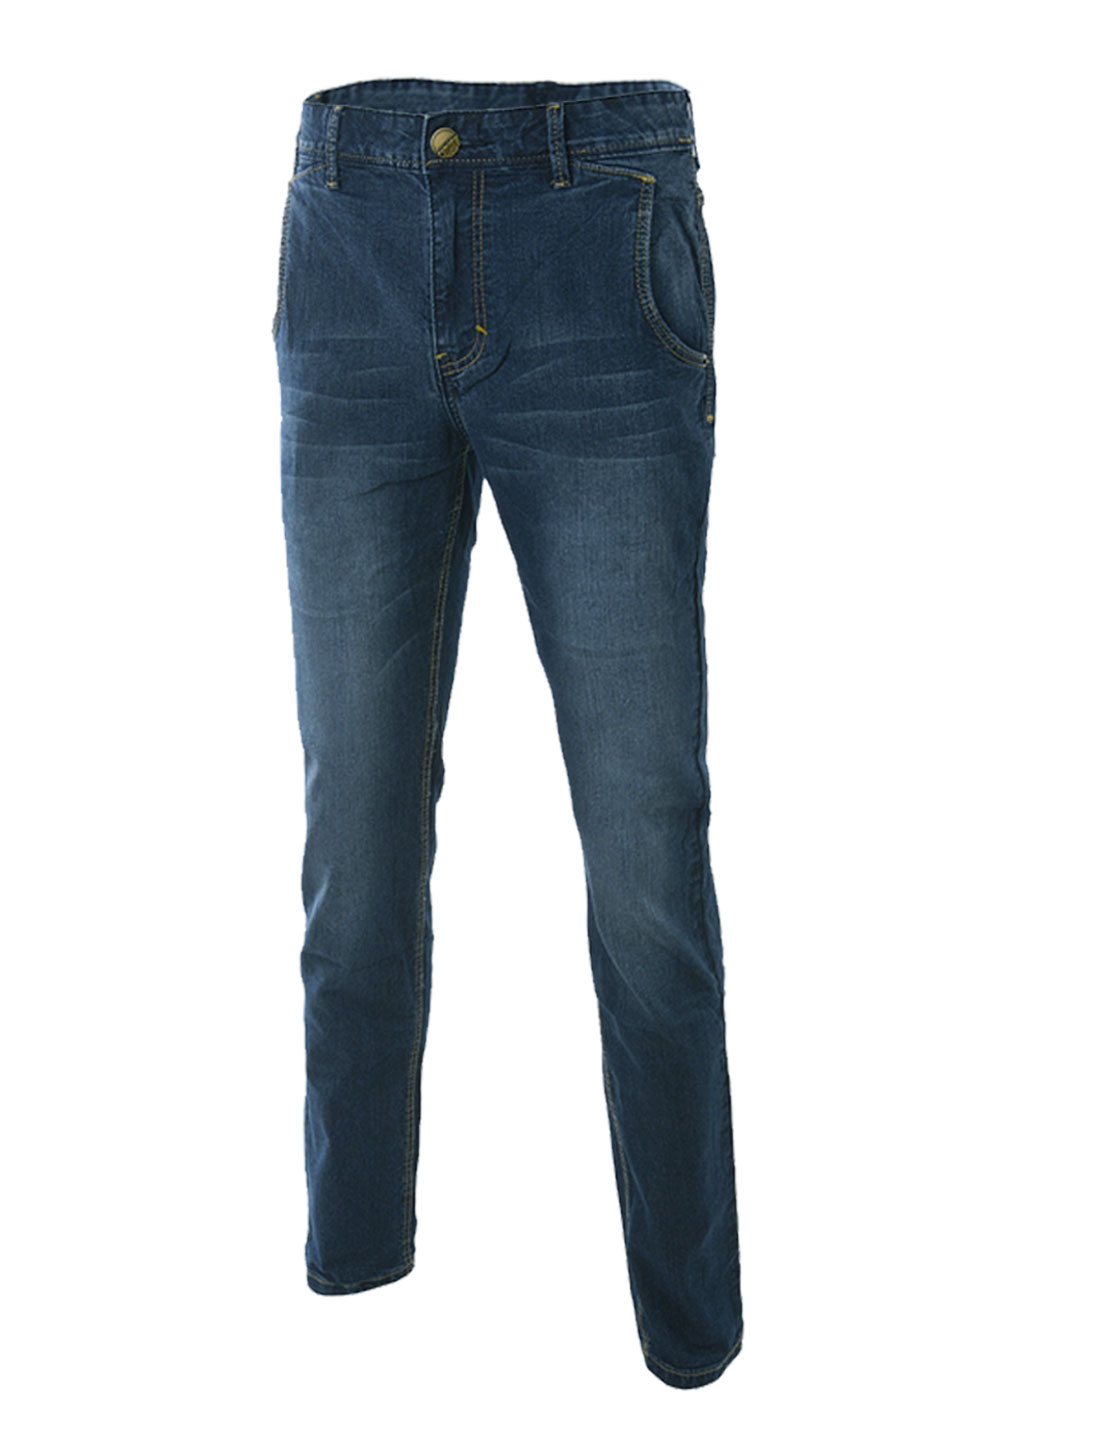 Man's Mid Rise Front Hip Pockets Zip Fly Denim Pants Dark Blue W32